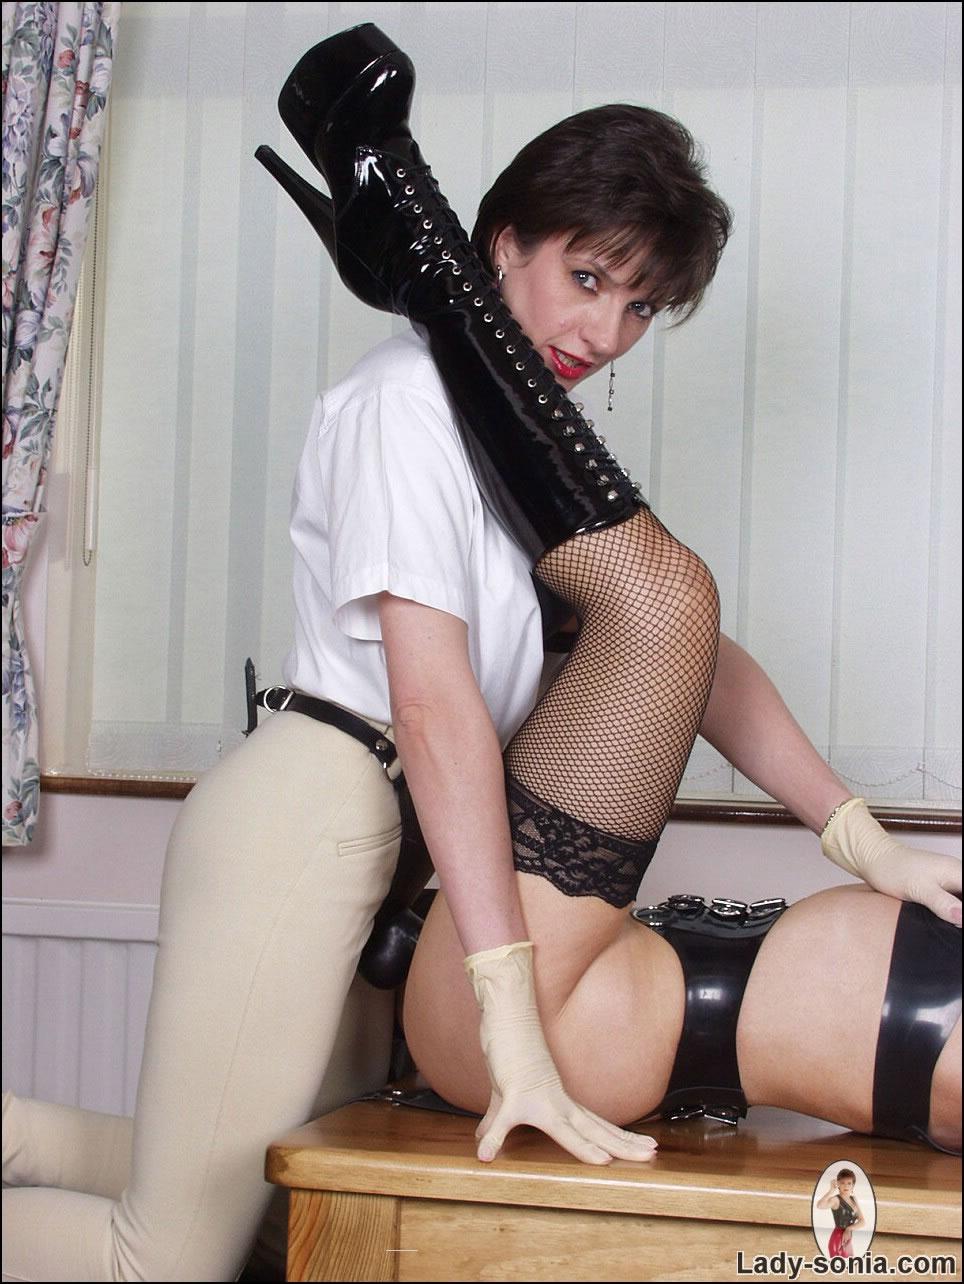 Adult Bondage Porn gallery girl lesbian picture sweet world adult hardcore sex